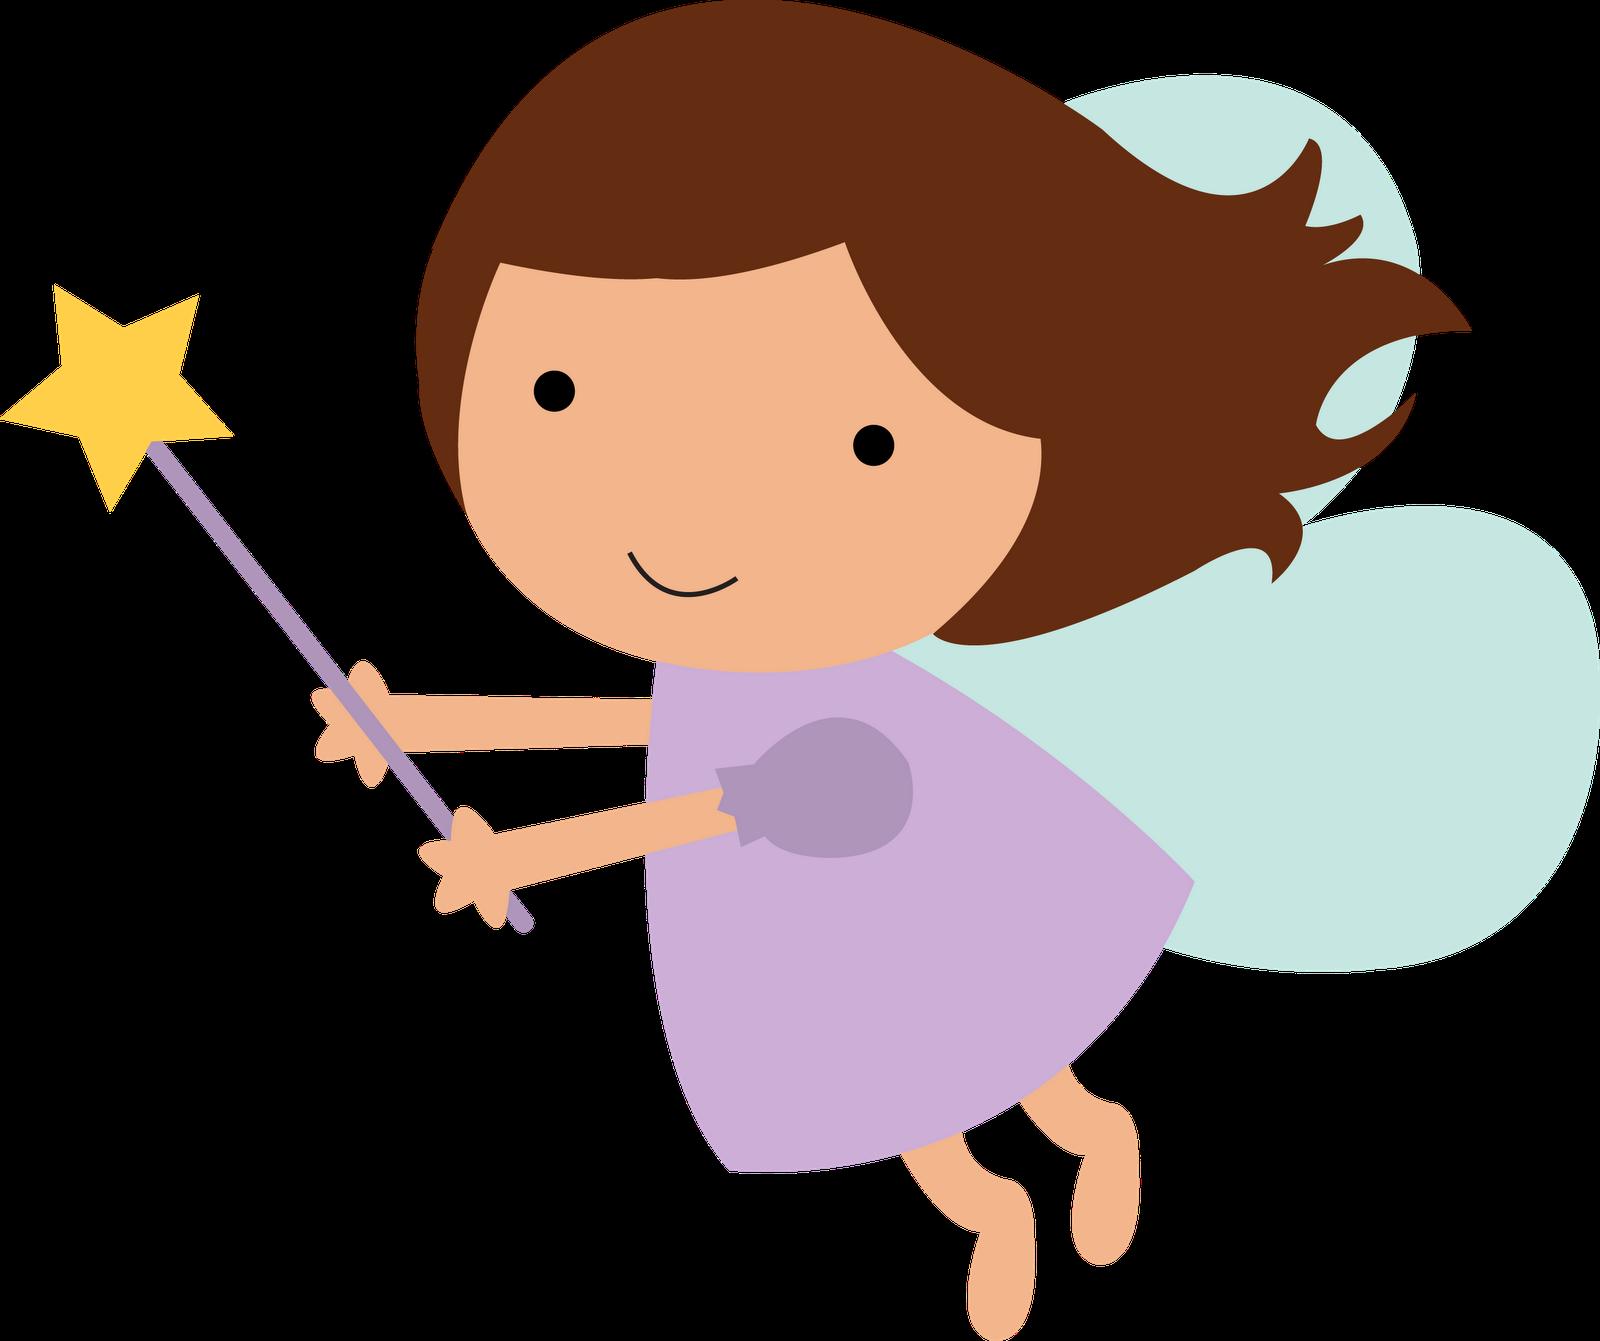 Fairy clip art images illustrations photos